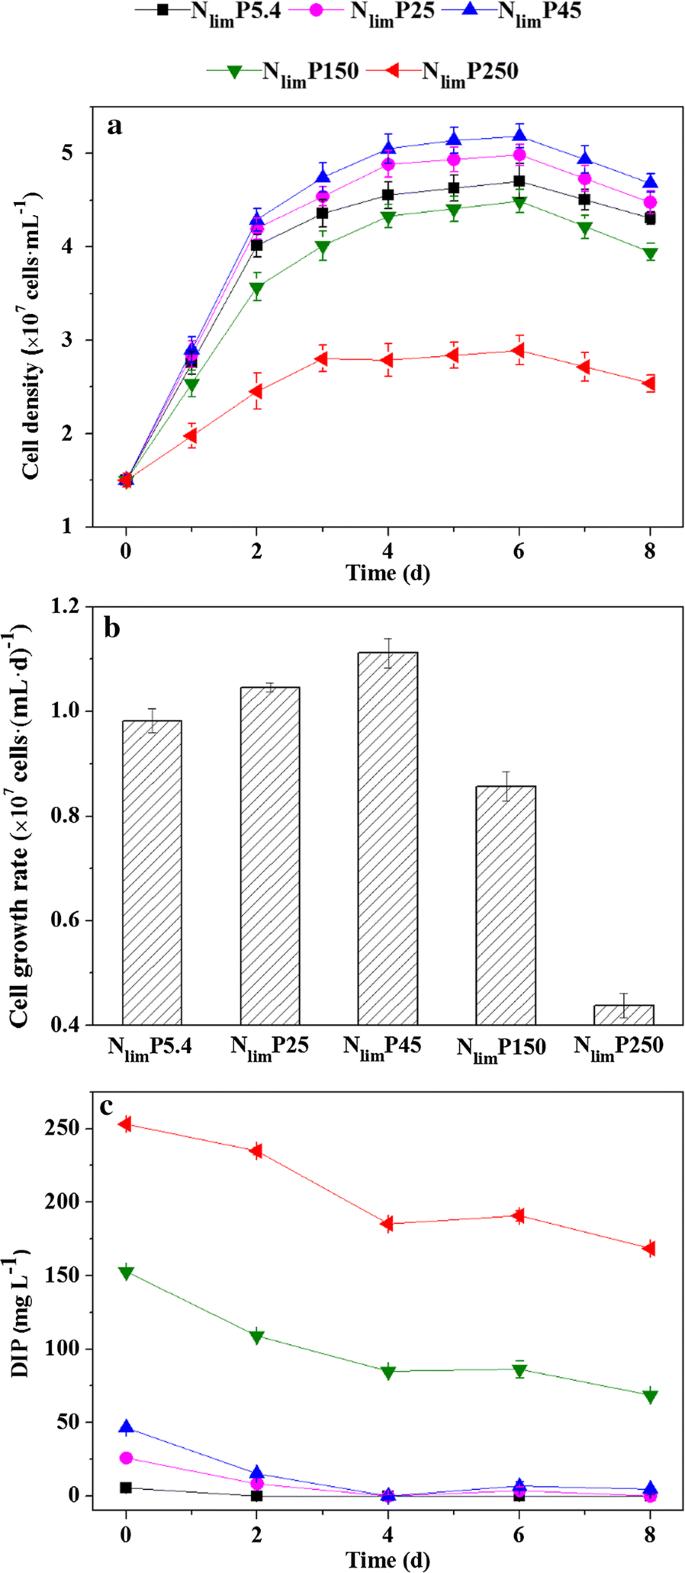 Hormesis effects of phosphorus on the viability of Chlorella